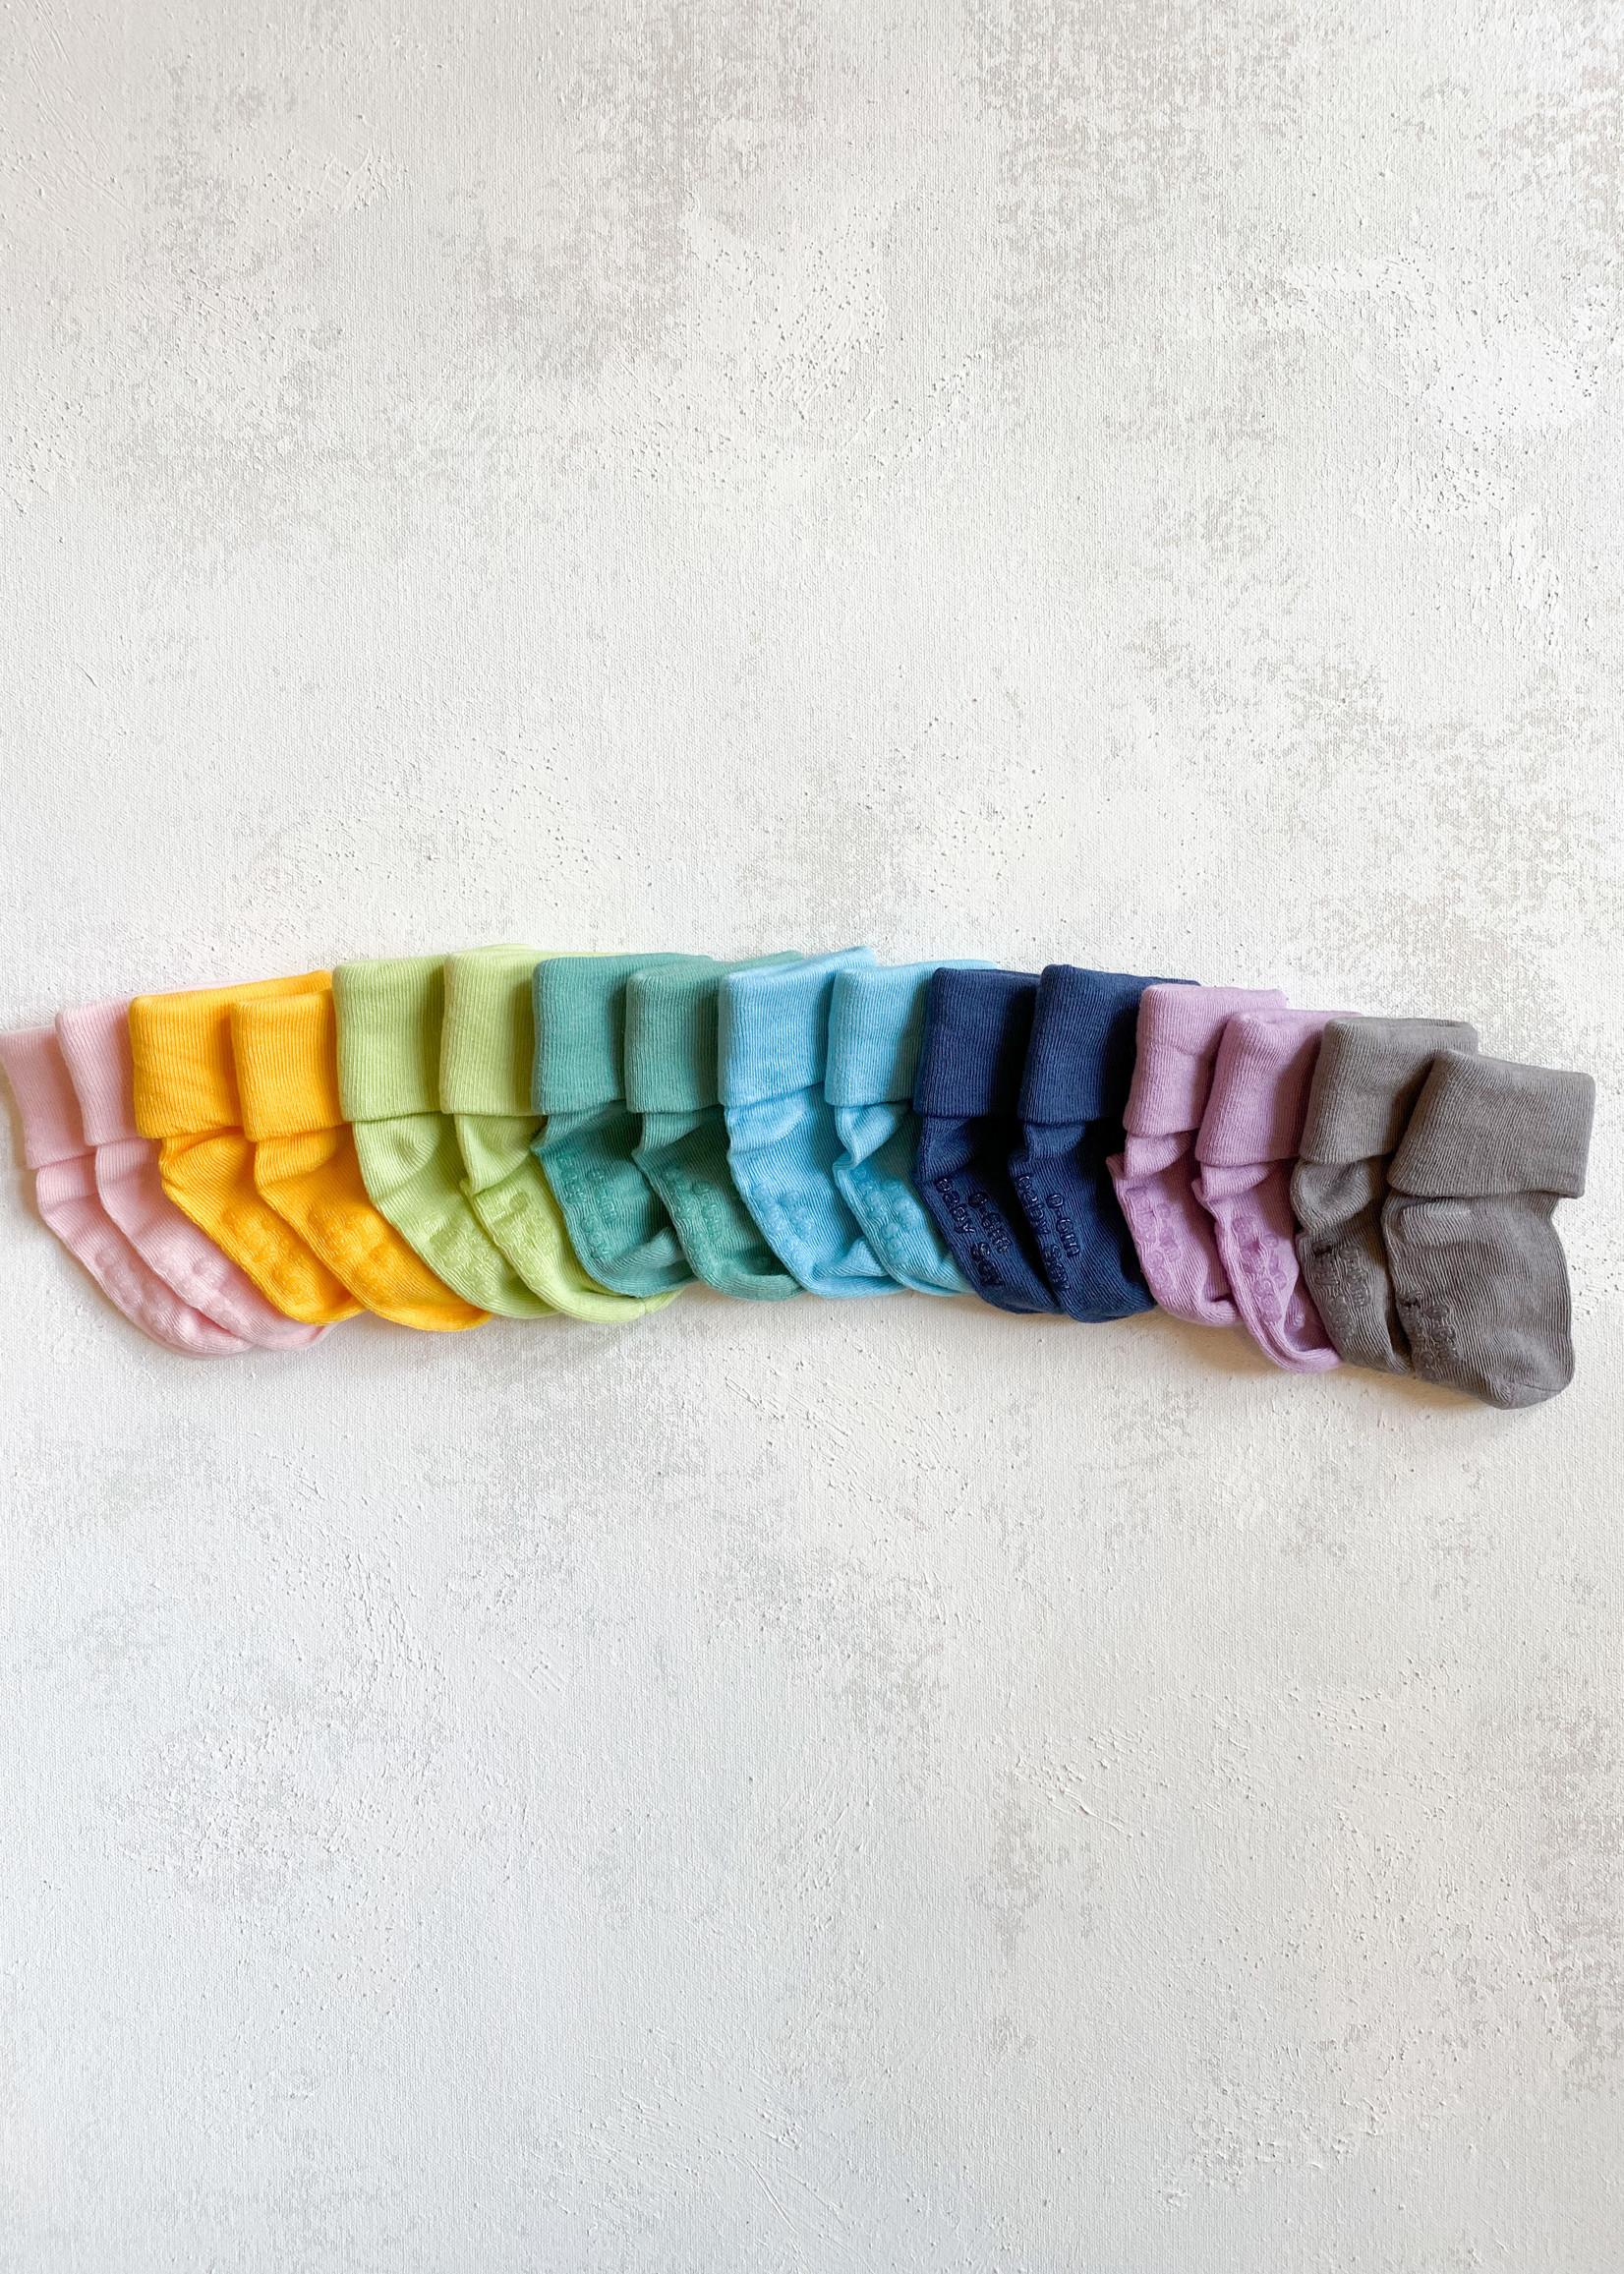 Elitaire Petite Modern Socks in Indigo